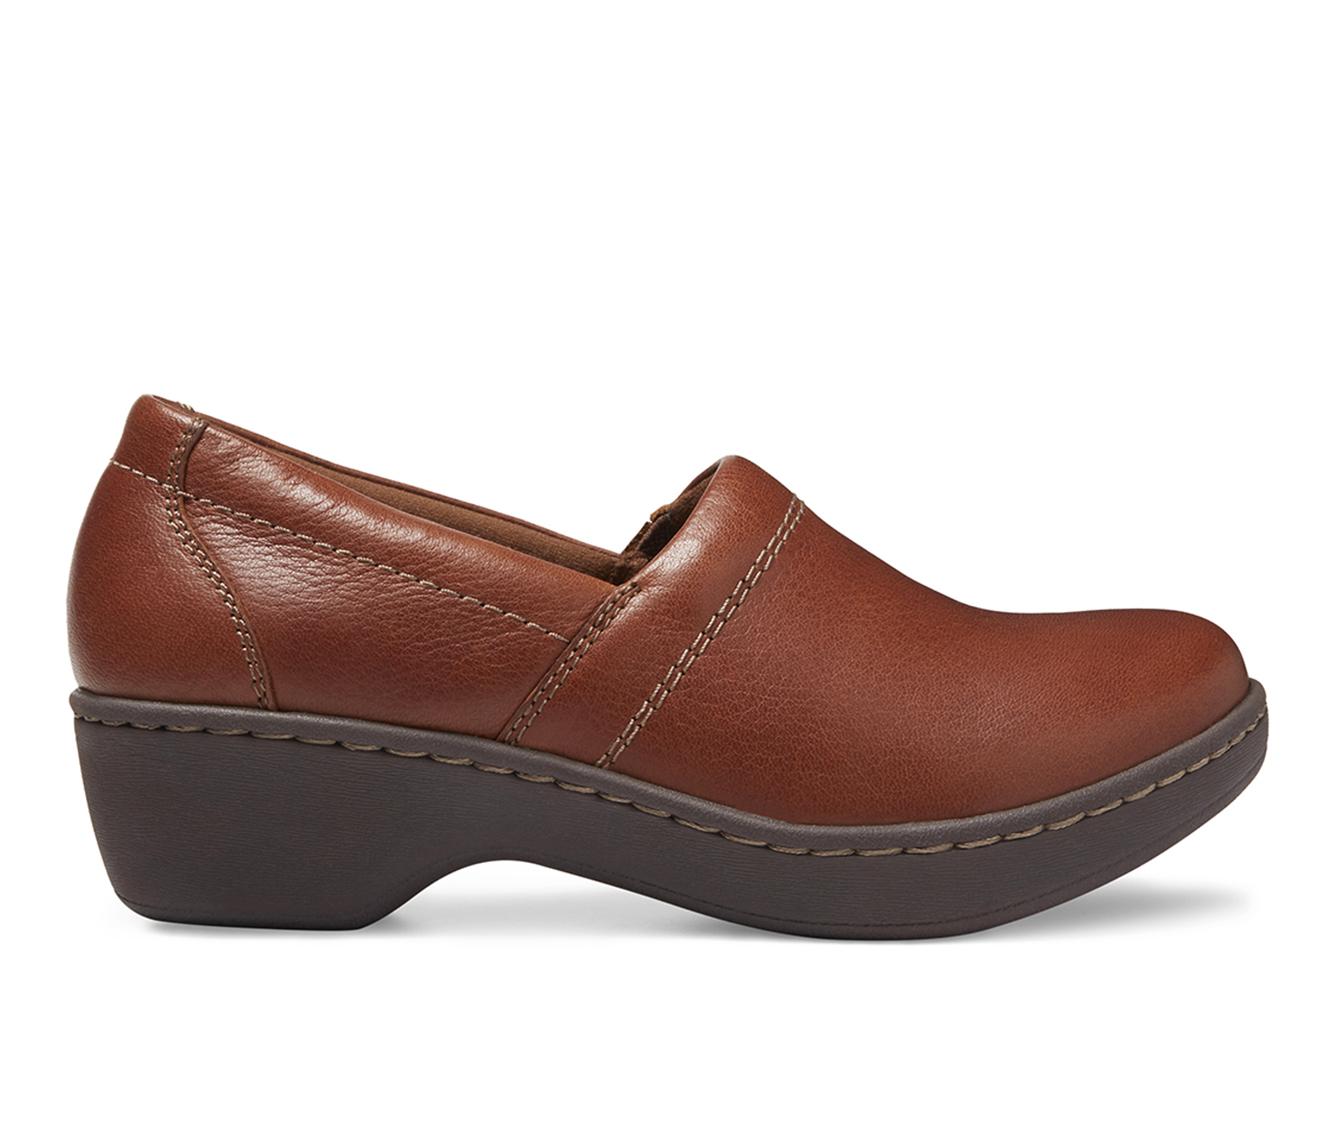 Eastland Constance Women's Shoe (Brown Leather)